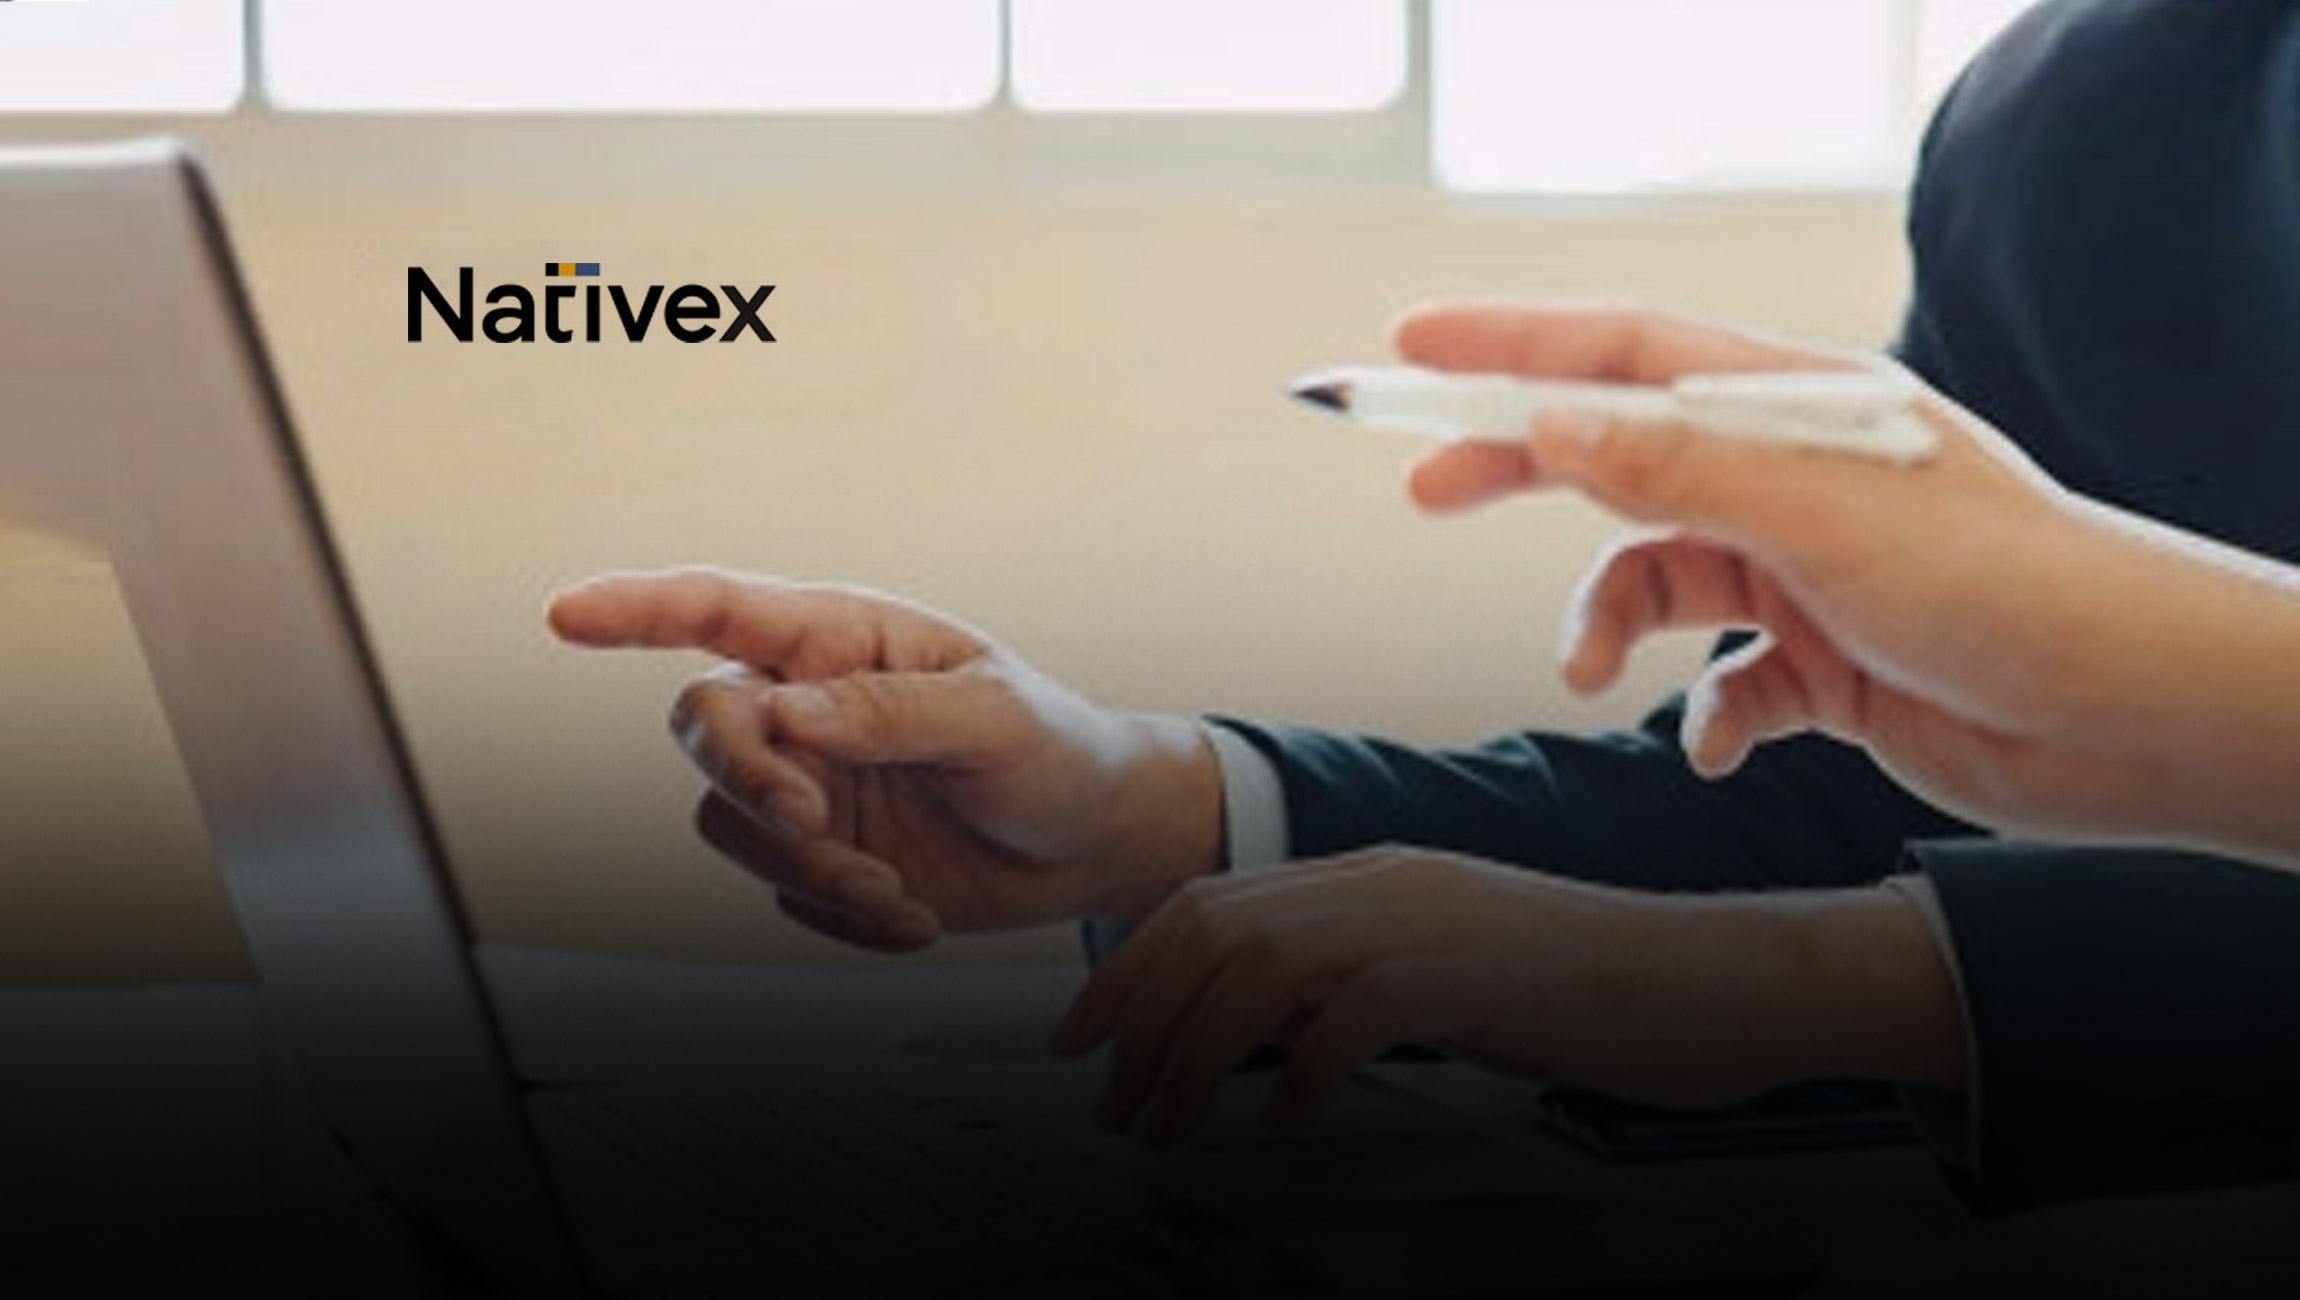 Nativex Joins the TikTok Marketing Partner Program, Provides Campaign and Creative Management Tools